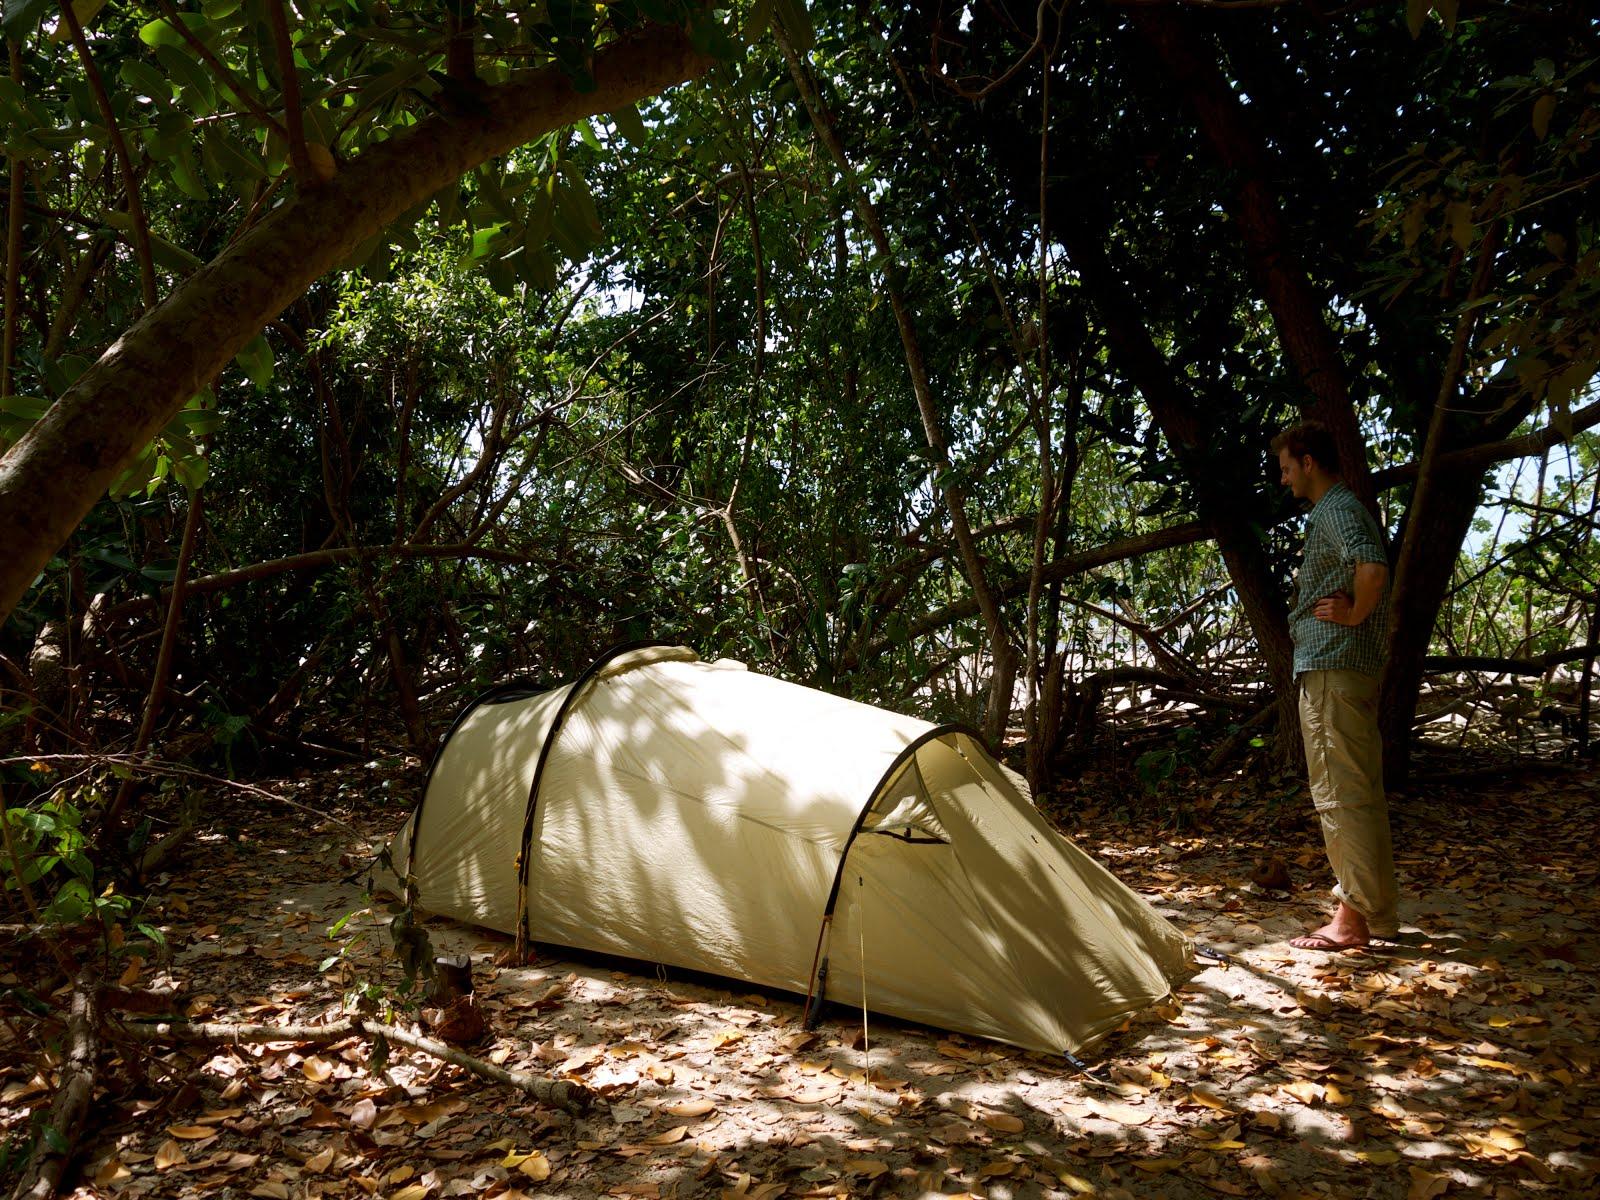 trampsouth Trail Tales from Te Araroa in New Zealand: Gear